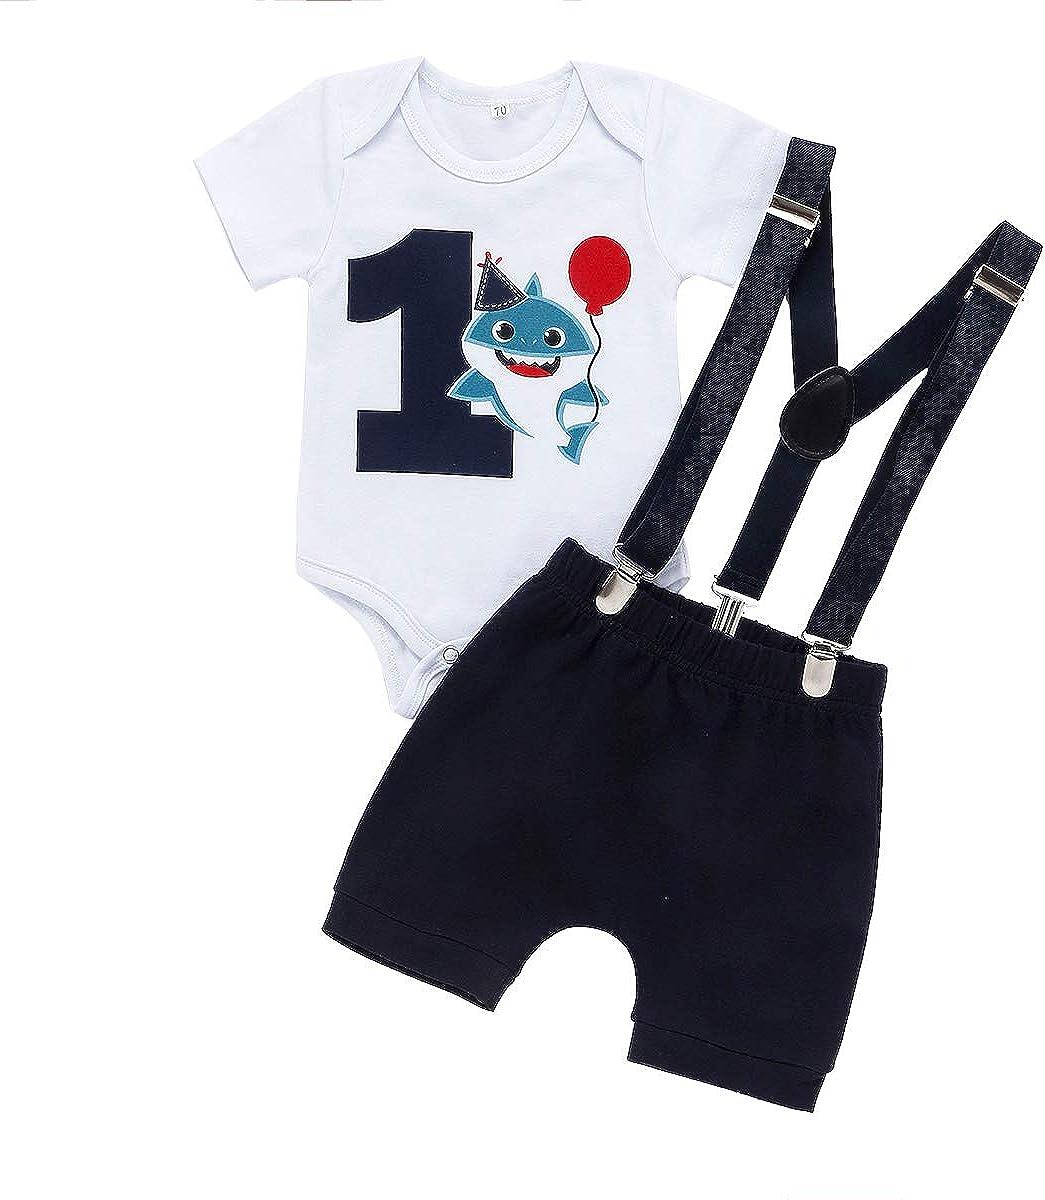 Baby Shark Summer Clothes Toddler Boy Shark Shorts Set Kids Summer Outfits Clothes Set